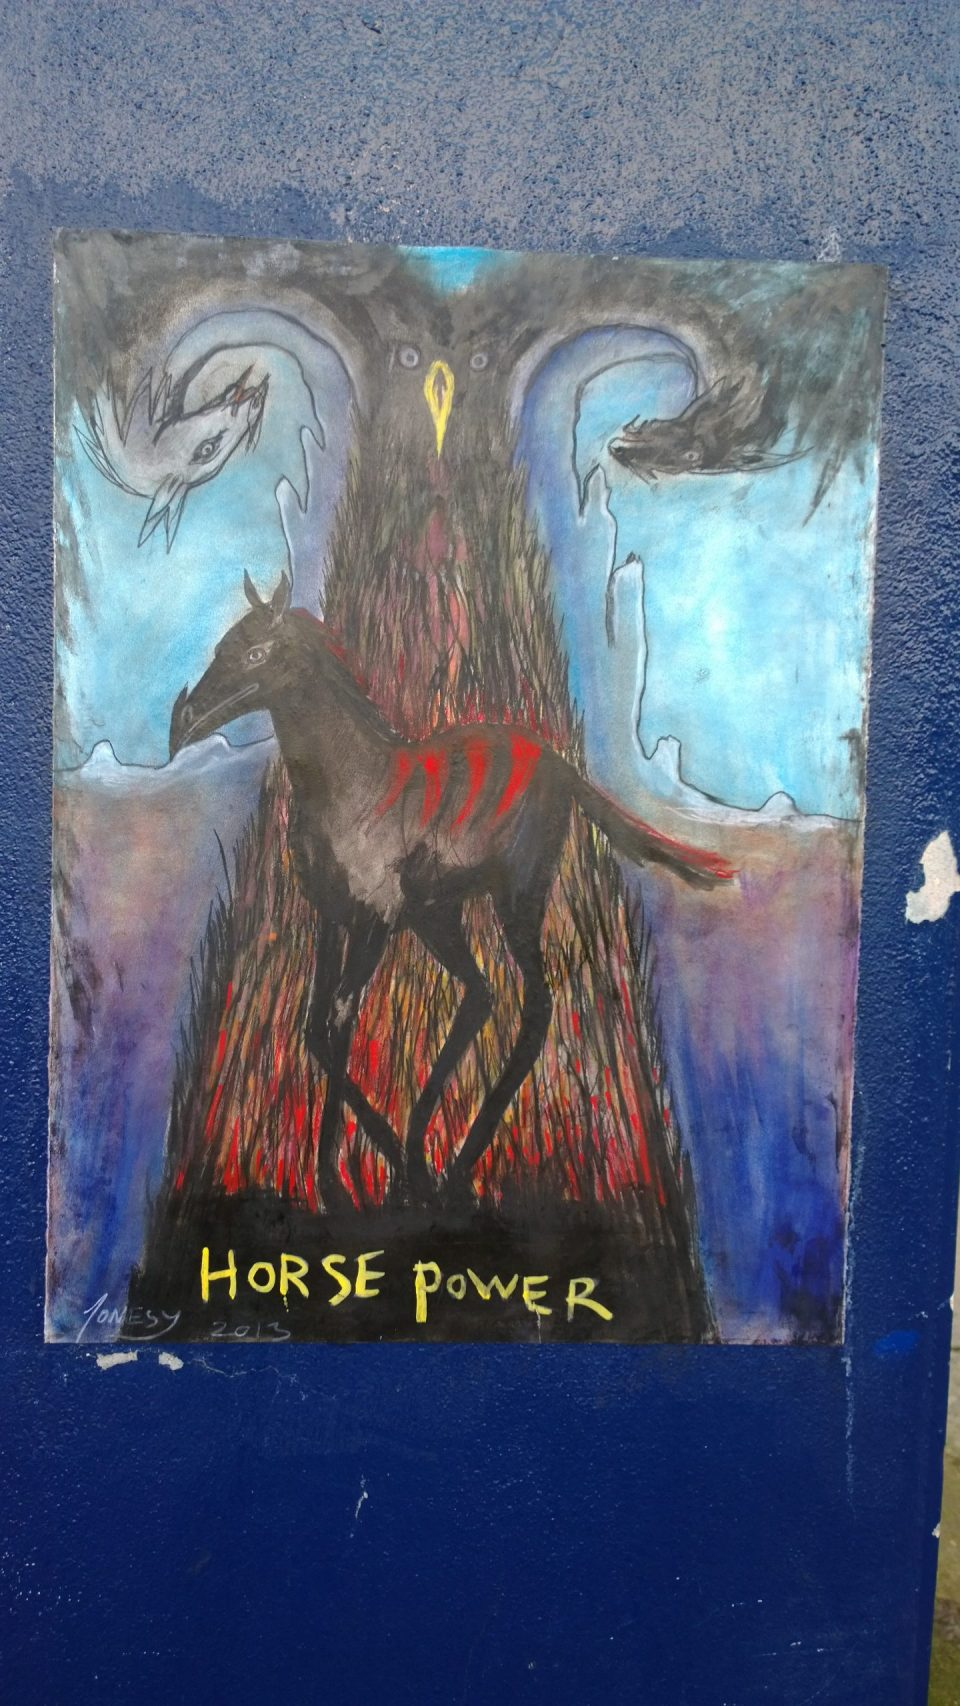 Original art paste up from Jonesy on Hanbury Street